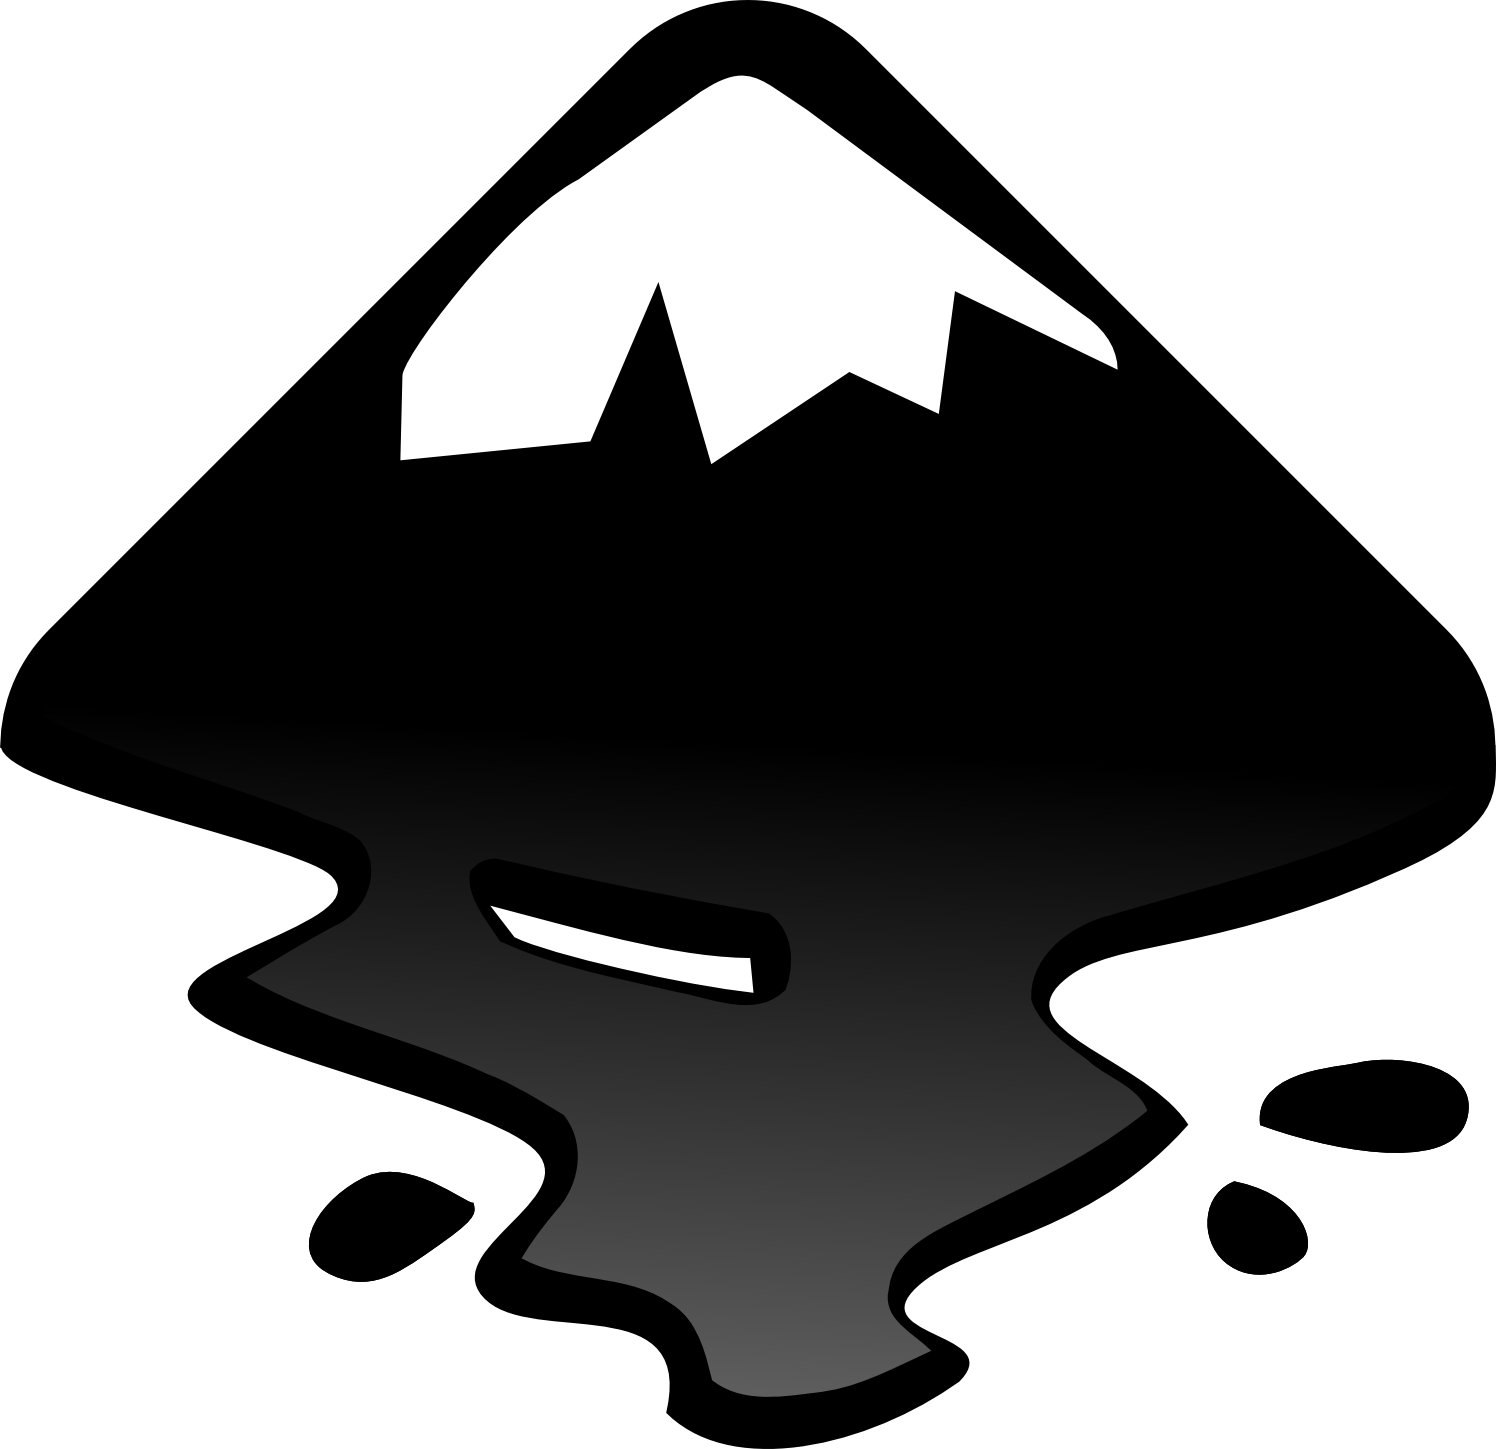 inkscape-logo-40.png?nocache=1309013548039